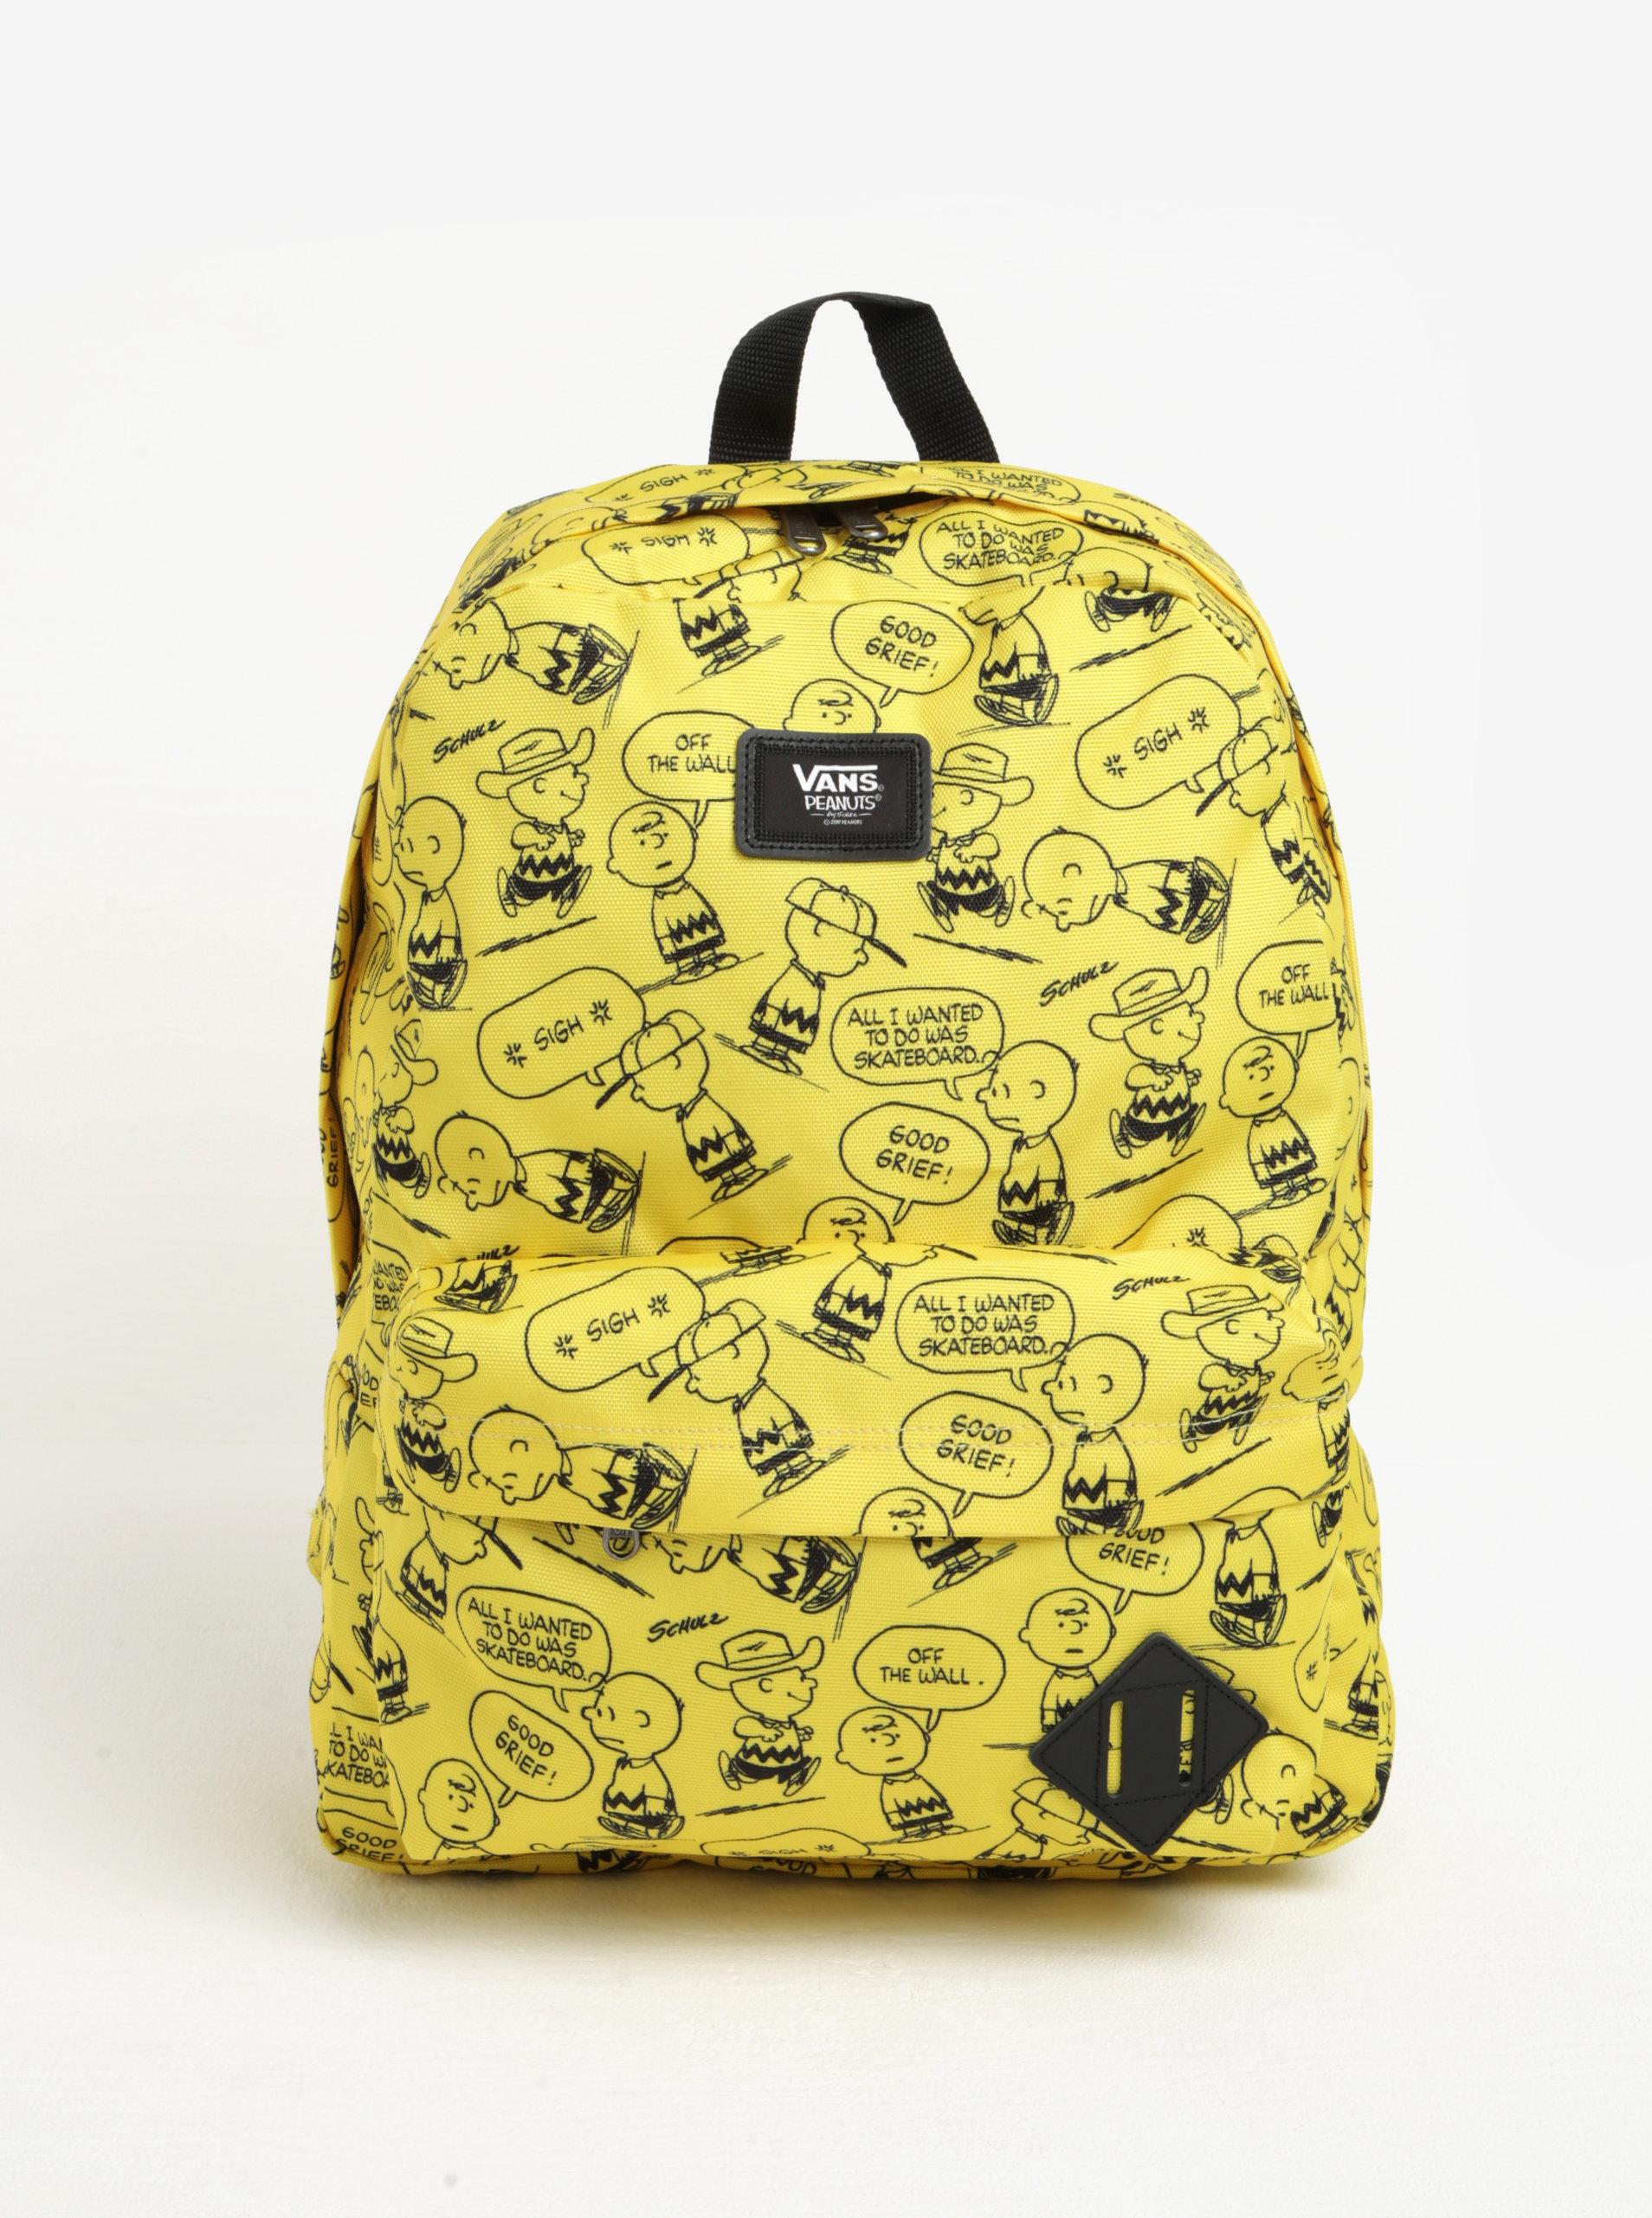 77762808123 Žlutý vzorovaný batoh VANS Peanuts ...